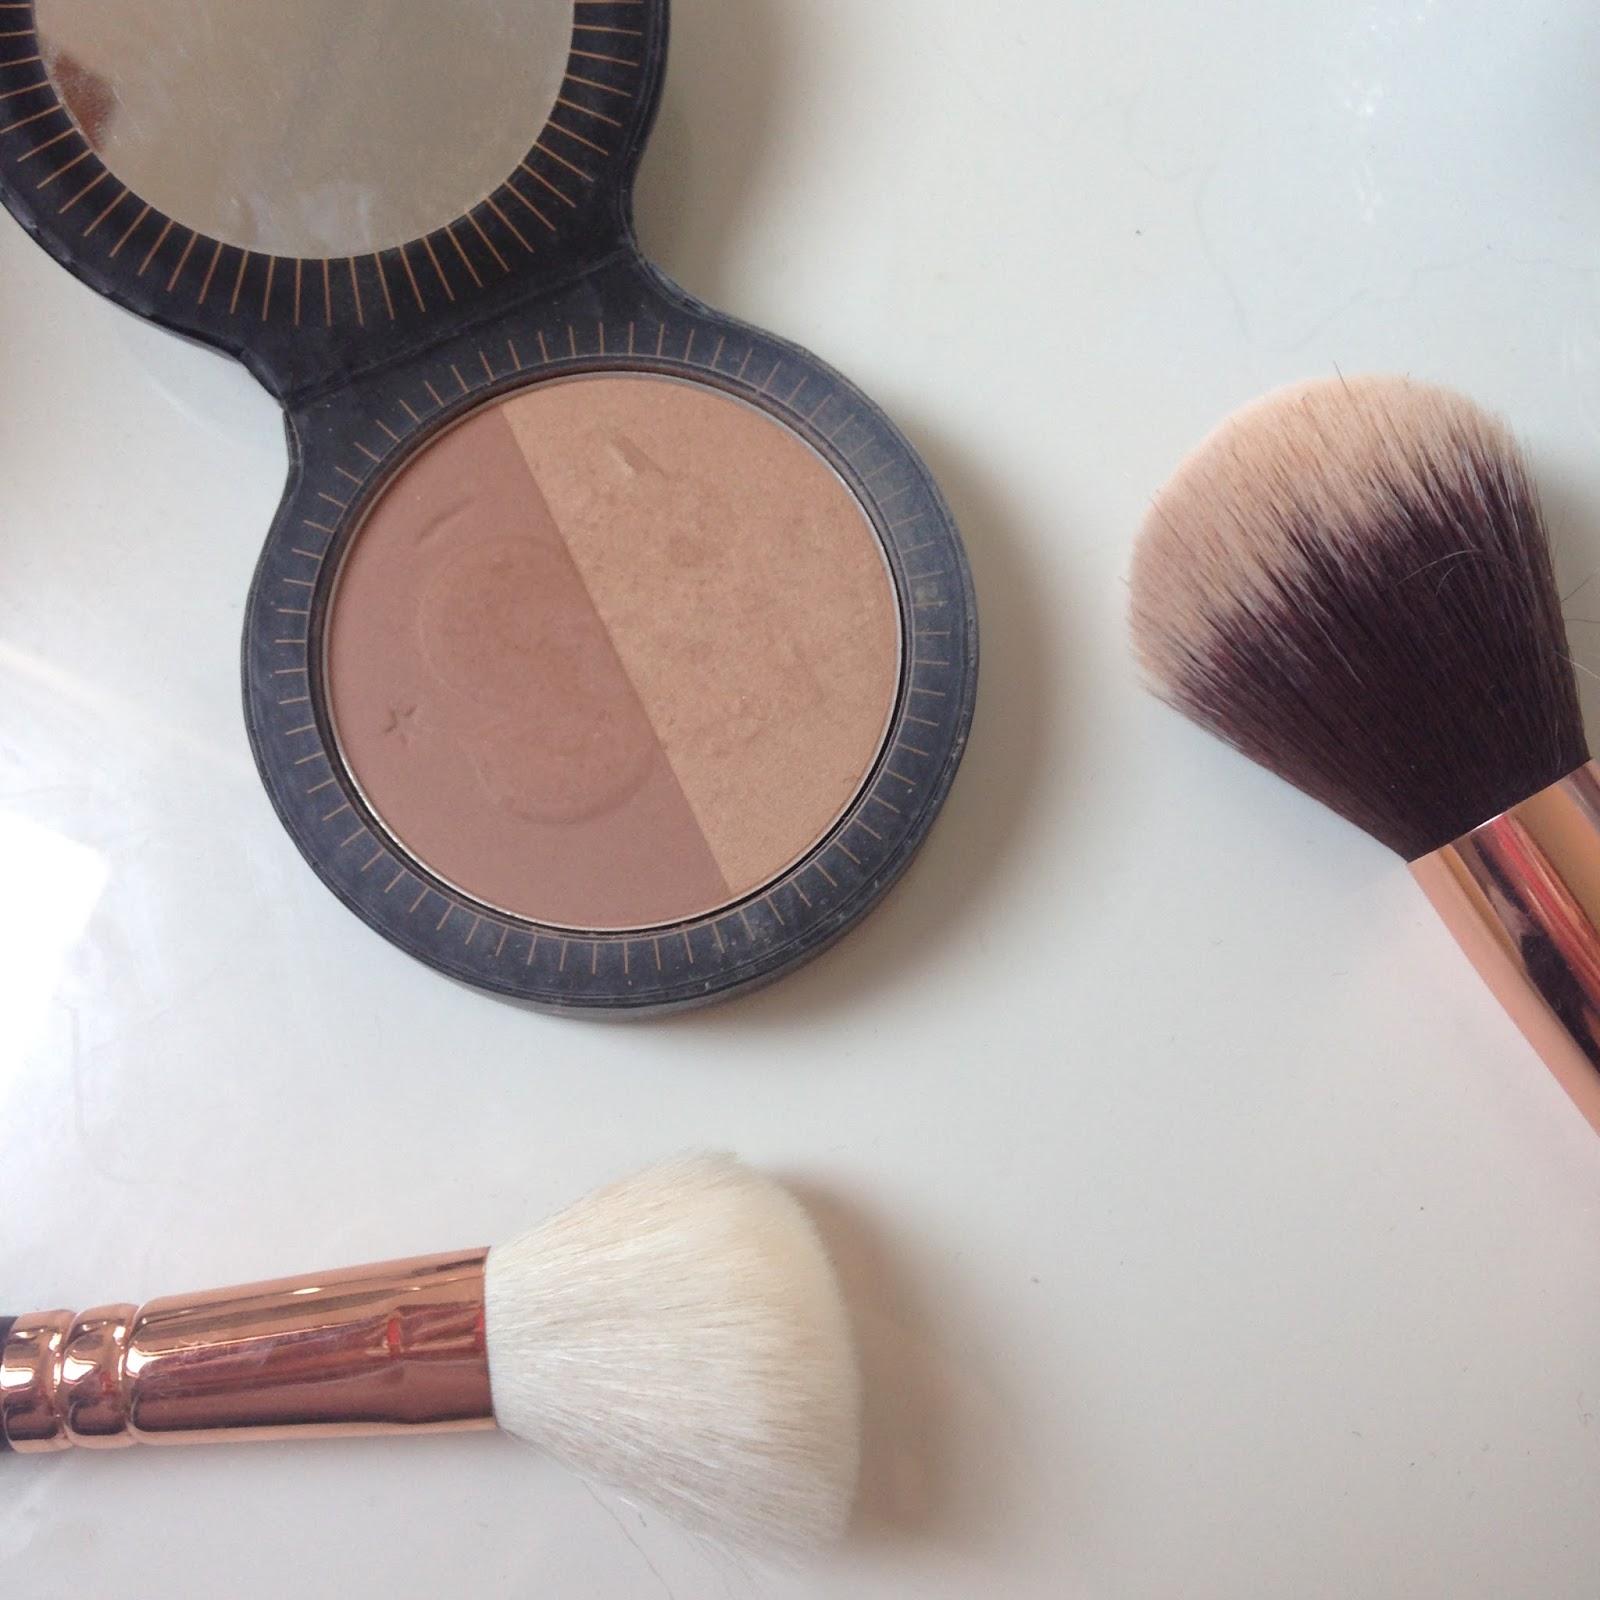 Review - Soap & Glory Solar Powder Bronzer